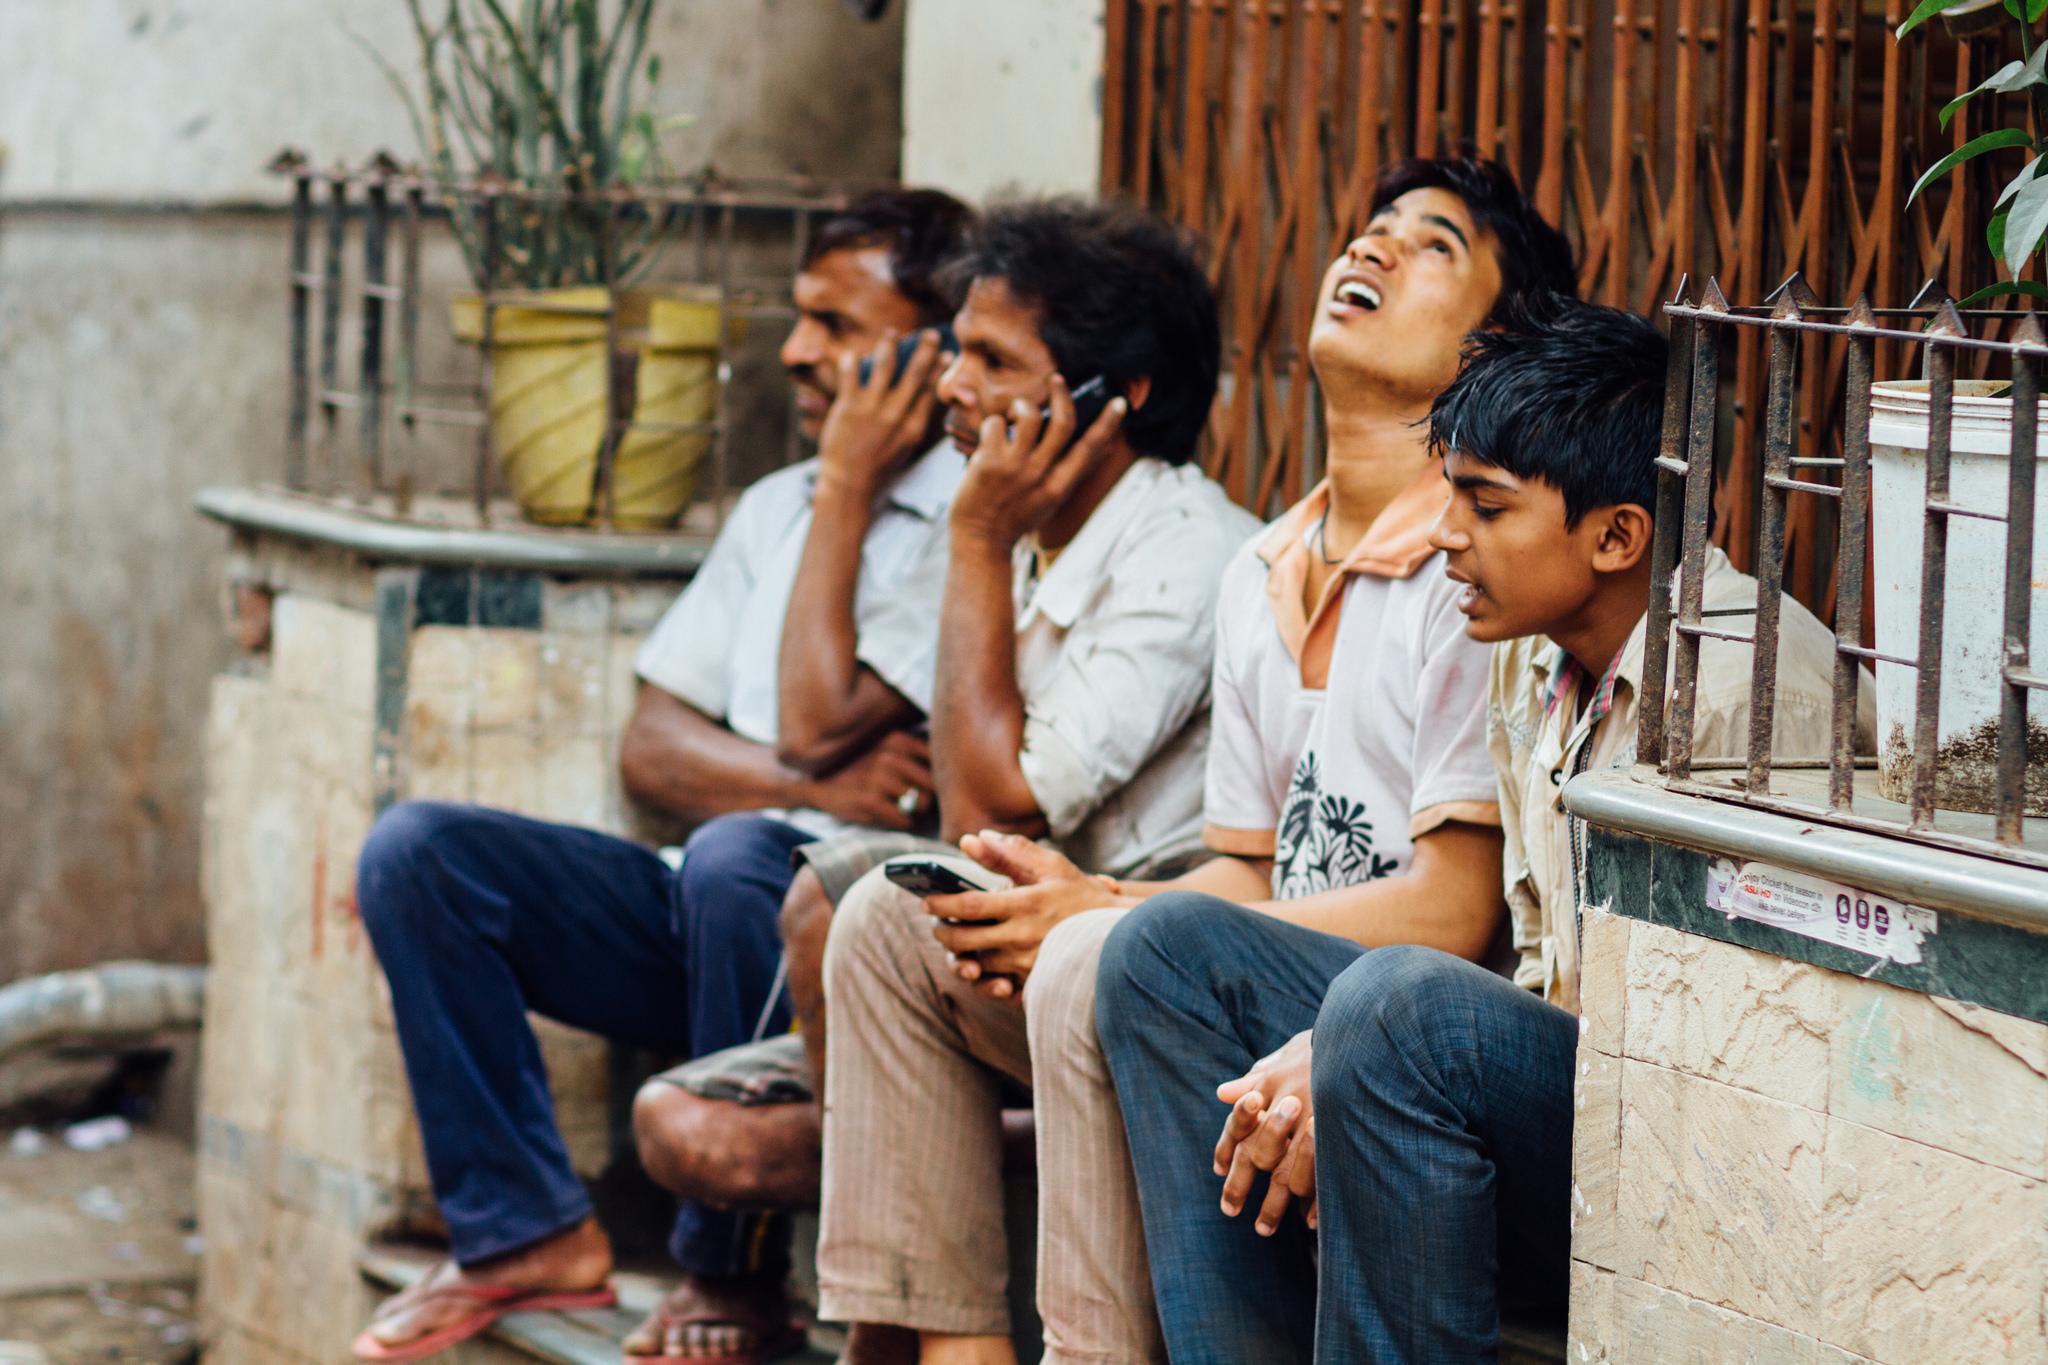 India's new smartphone buyers. Photo credit: Adam Cohn.